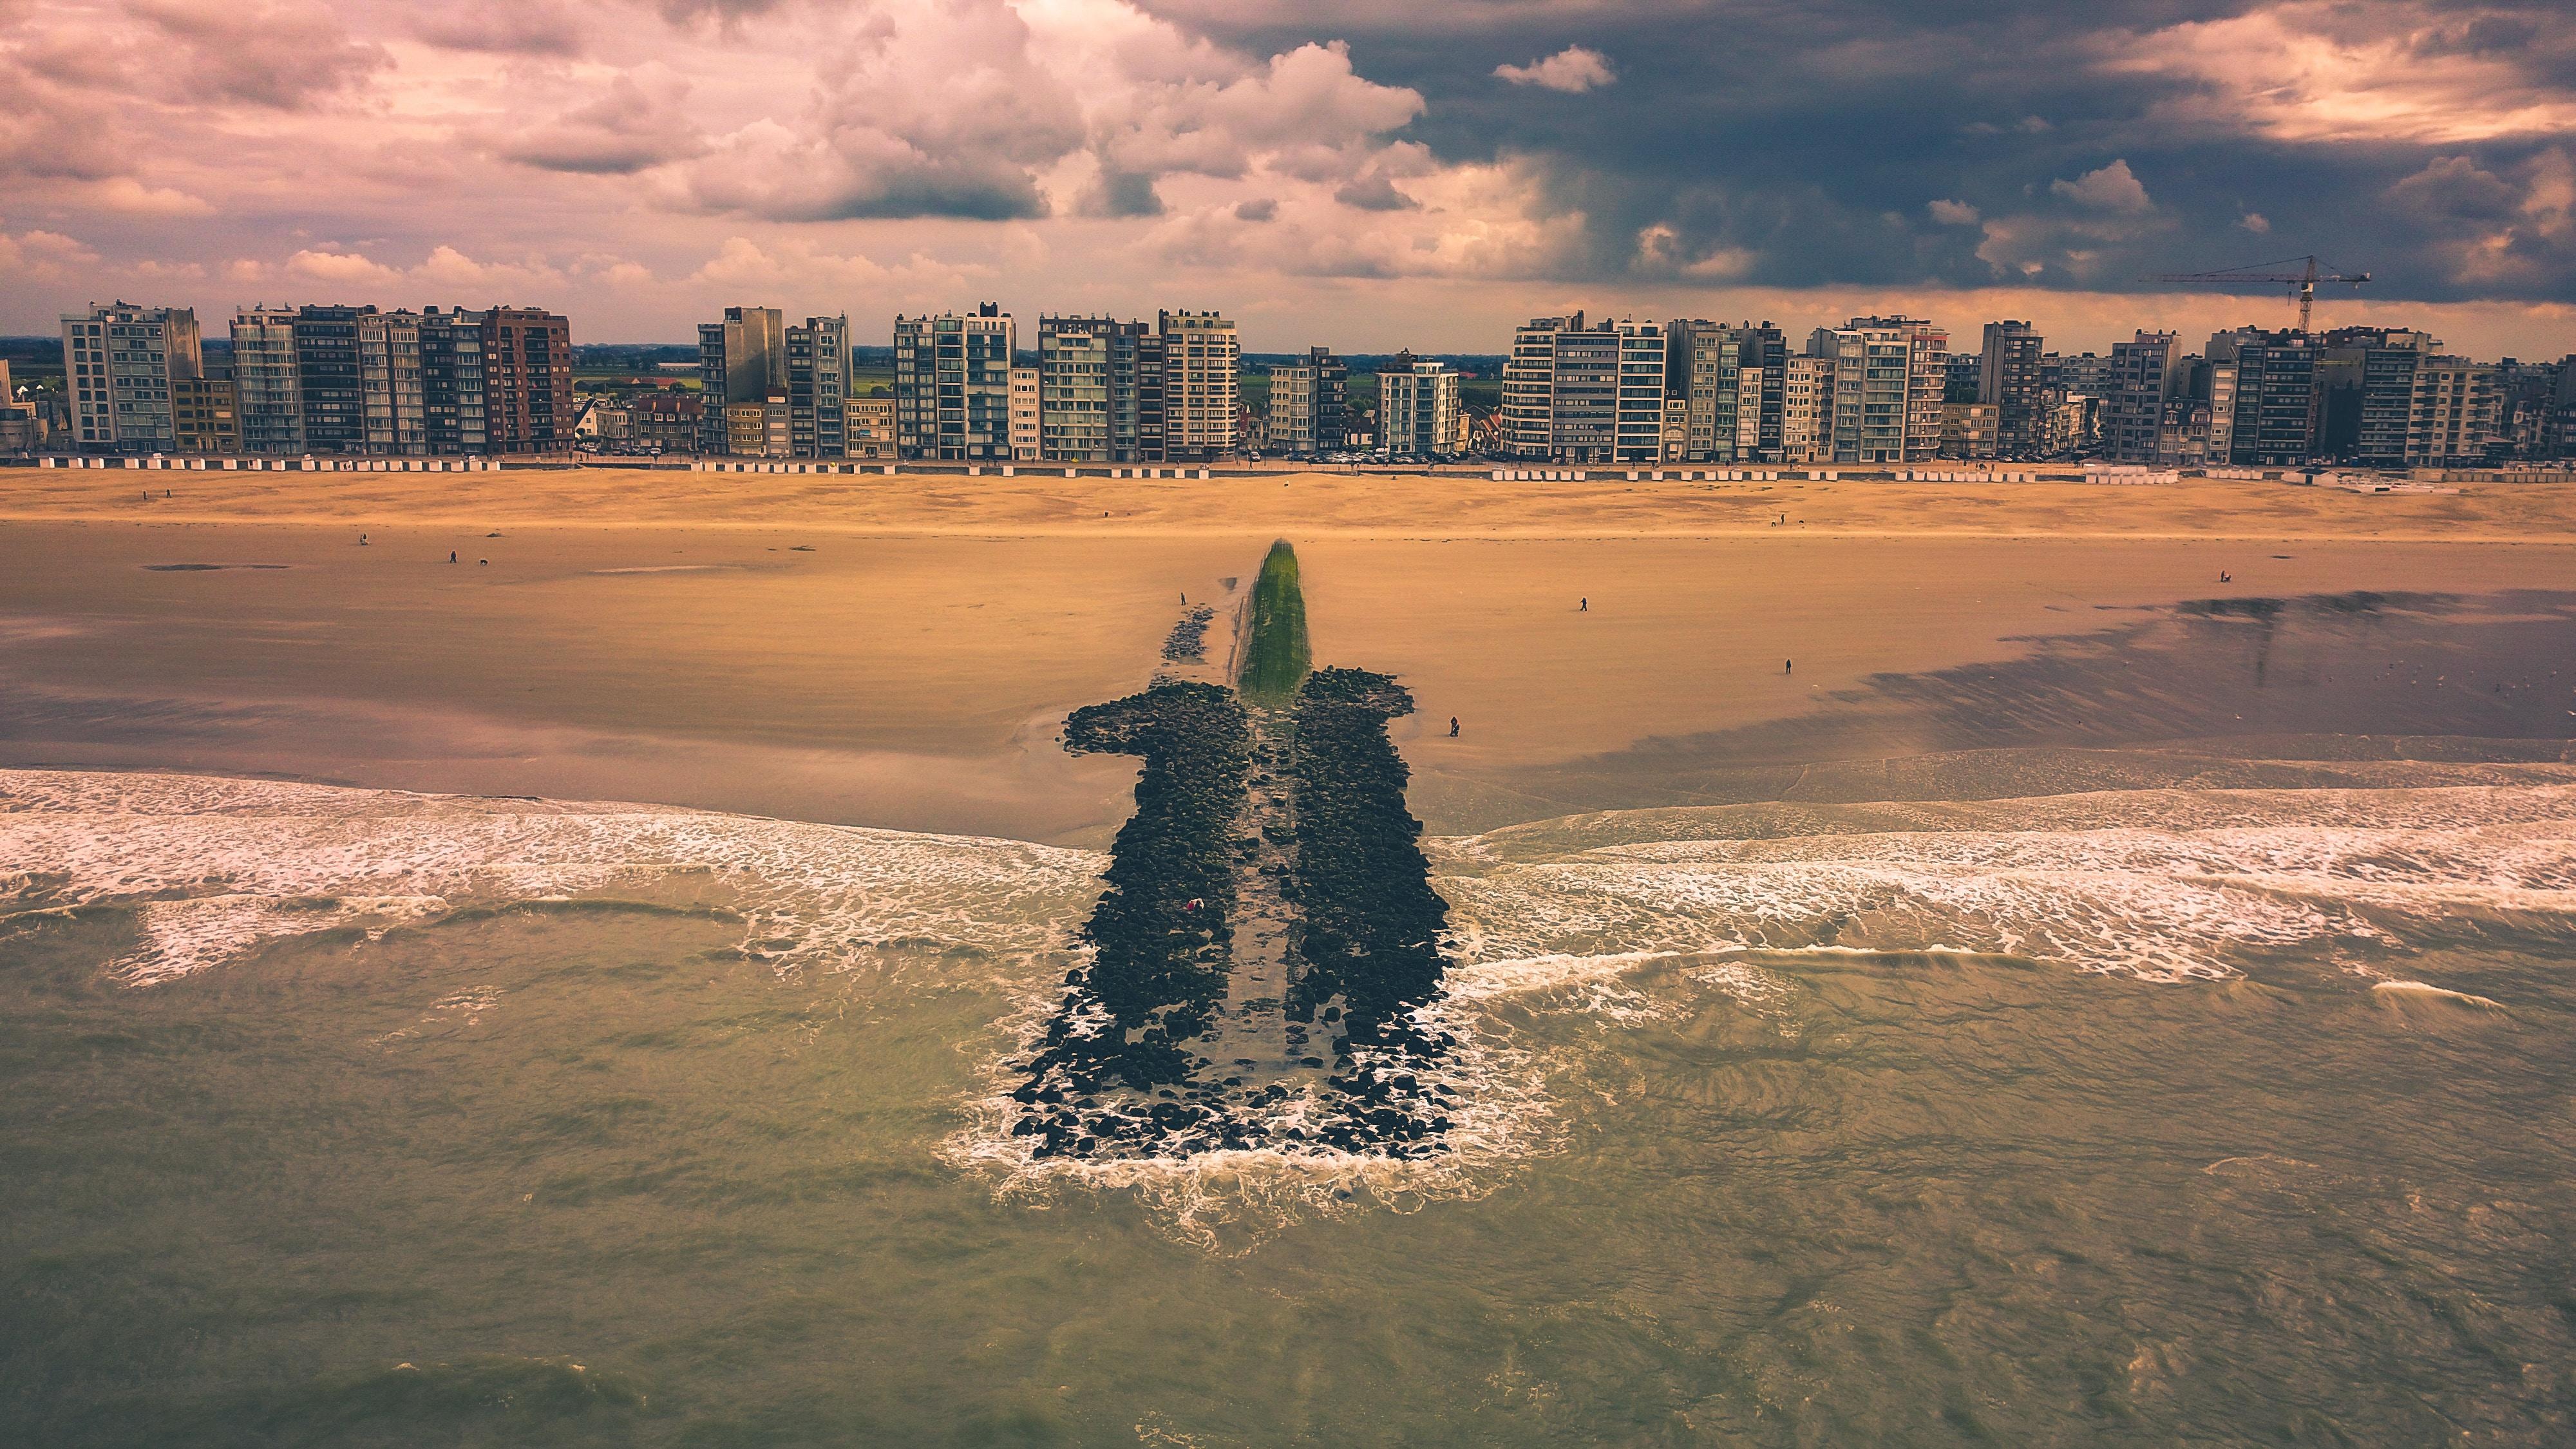 city buildings across beach shore